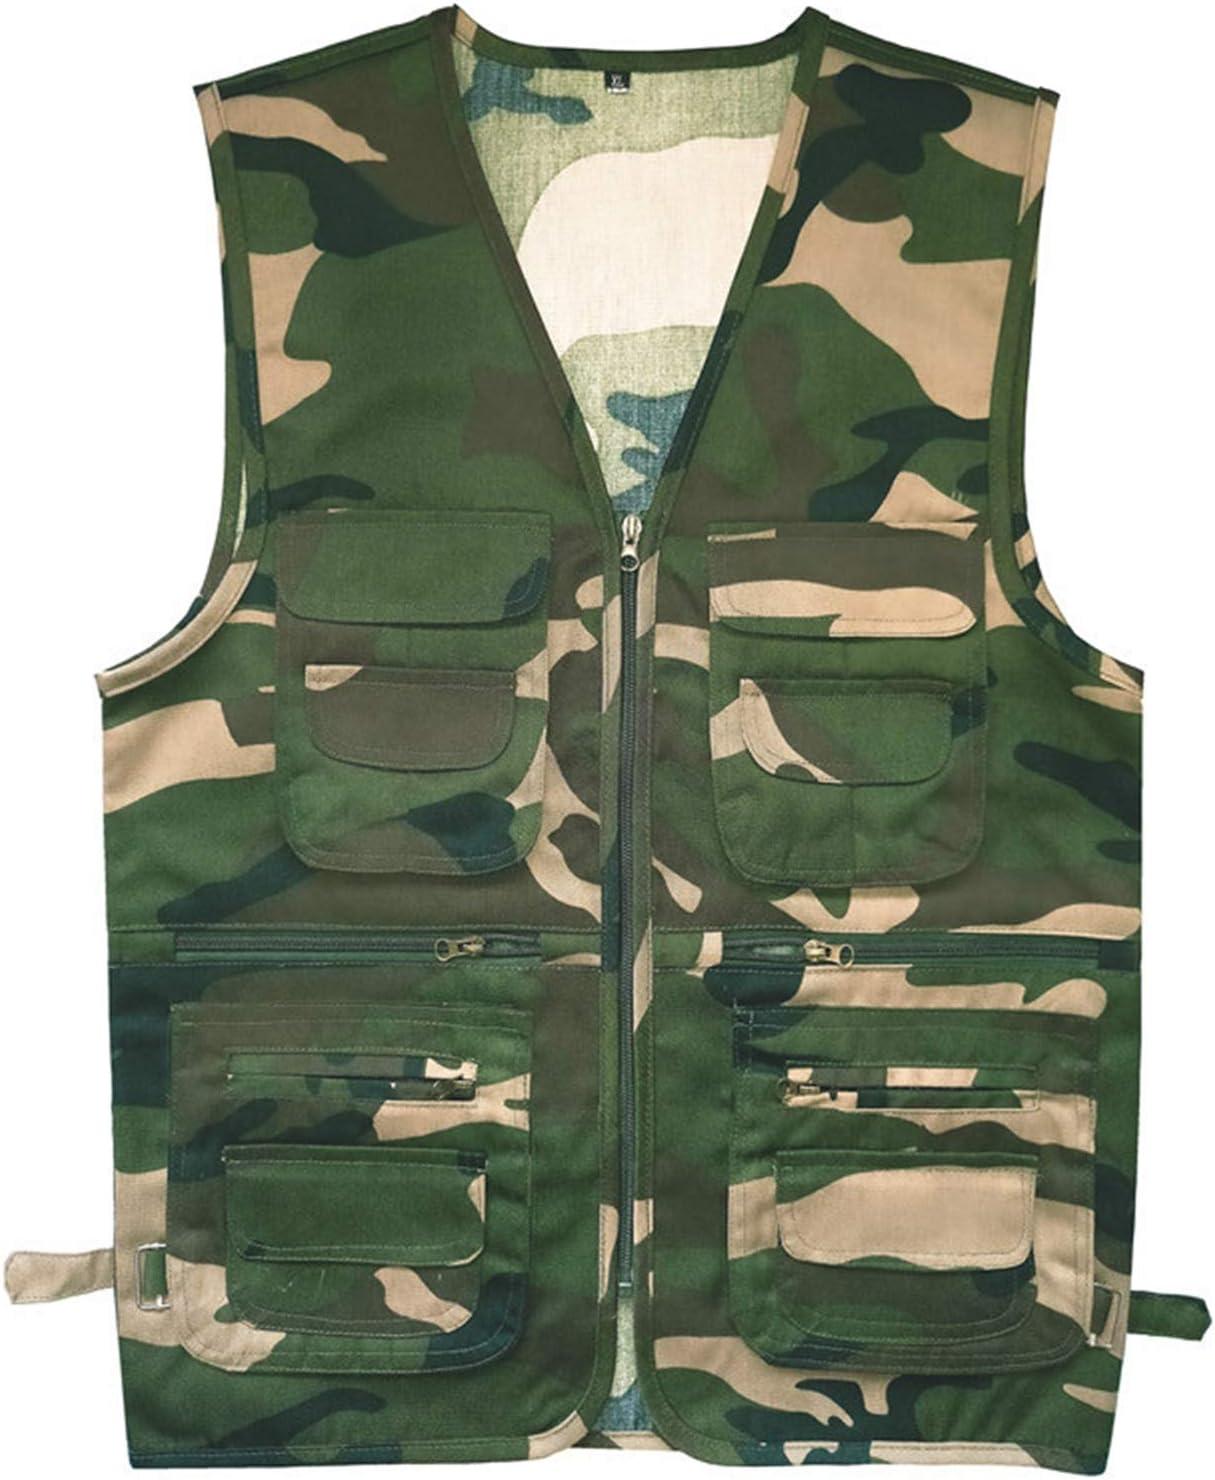 CNBPLS Men's Active Wear Outdoor Vests,Multi-Pocket Middle-Aged and Elderly Vest,Work Fishing Travel Utility Tank Tops,7,2XL